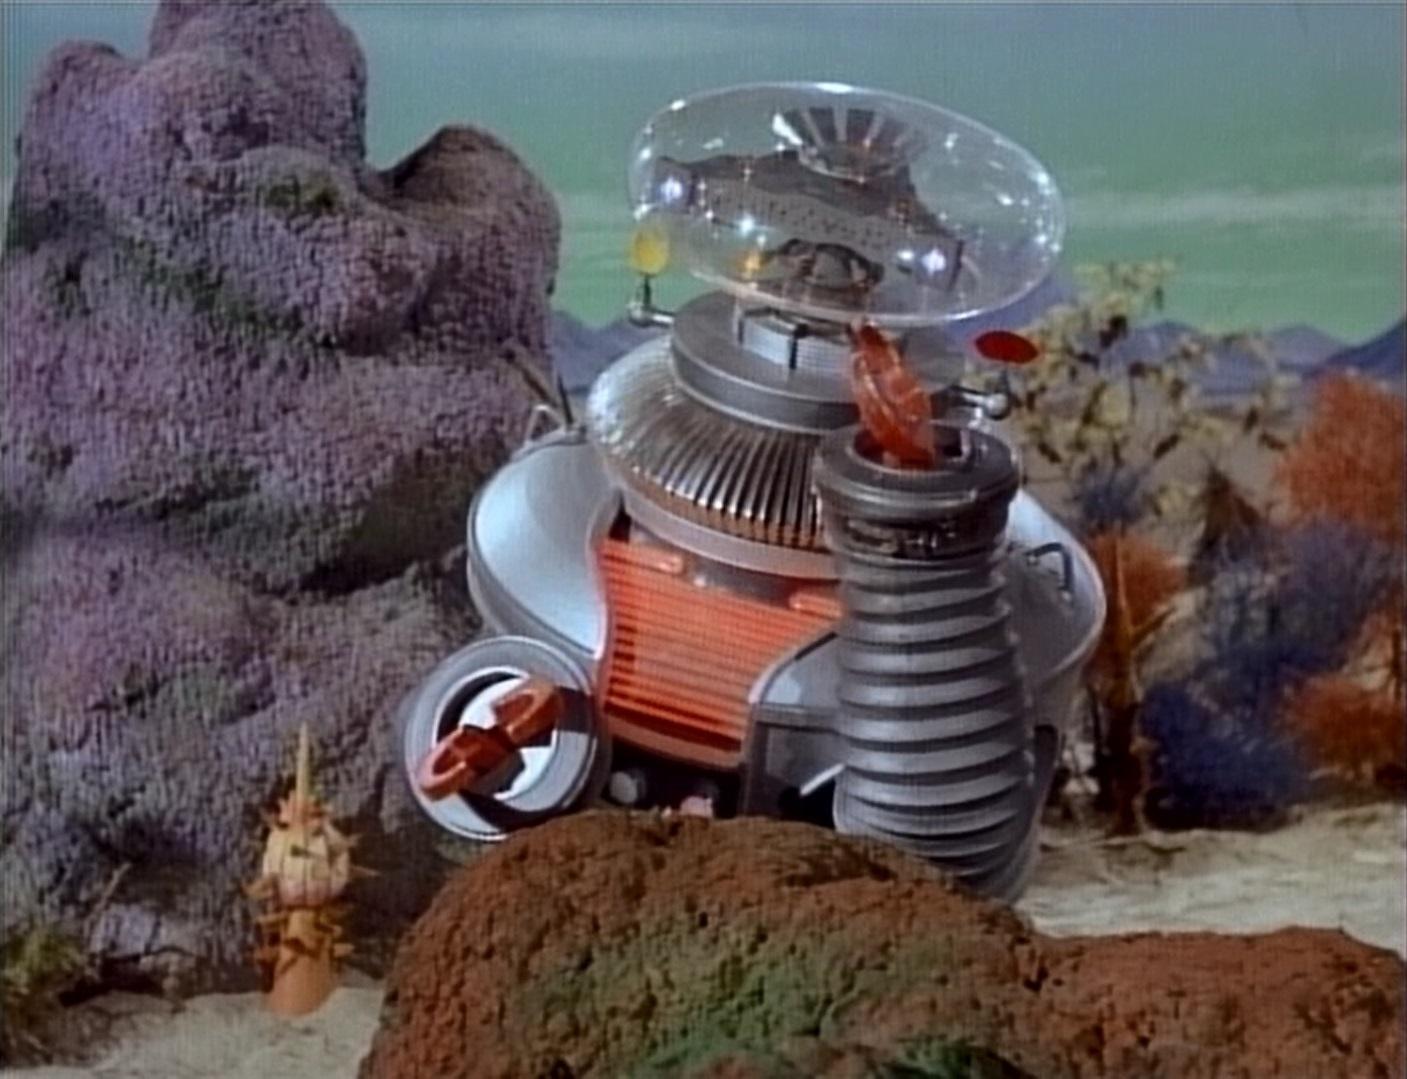 Deep Dive Review Of Netflix Lost In Space Reboot Episode